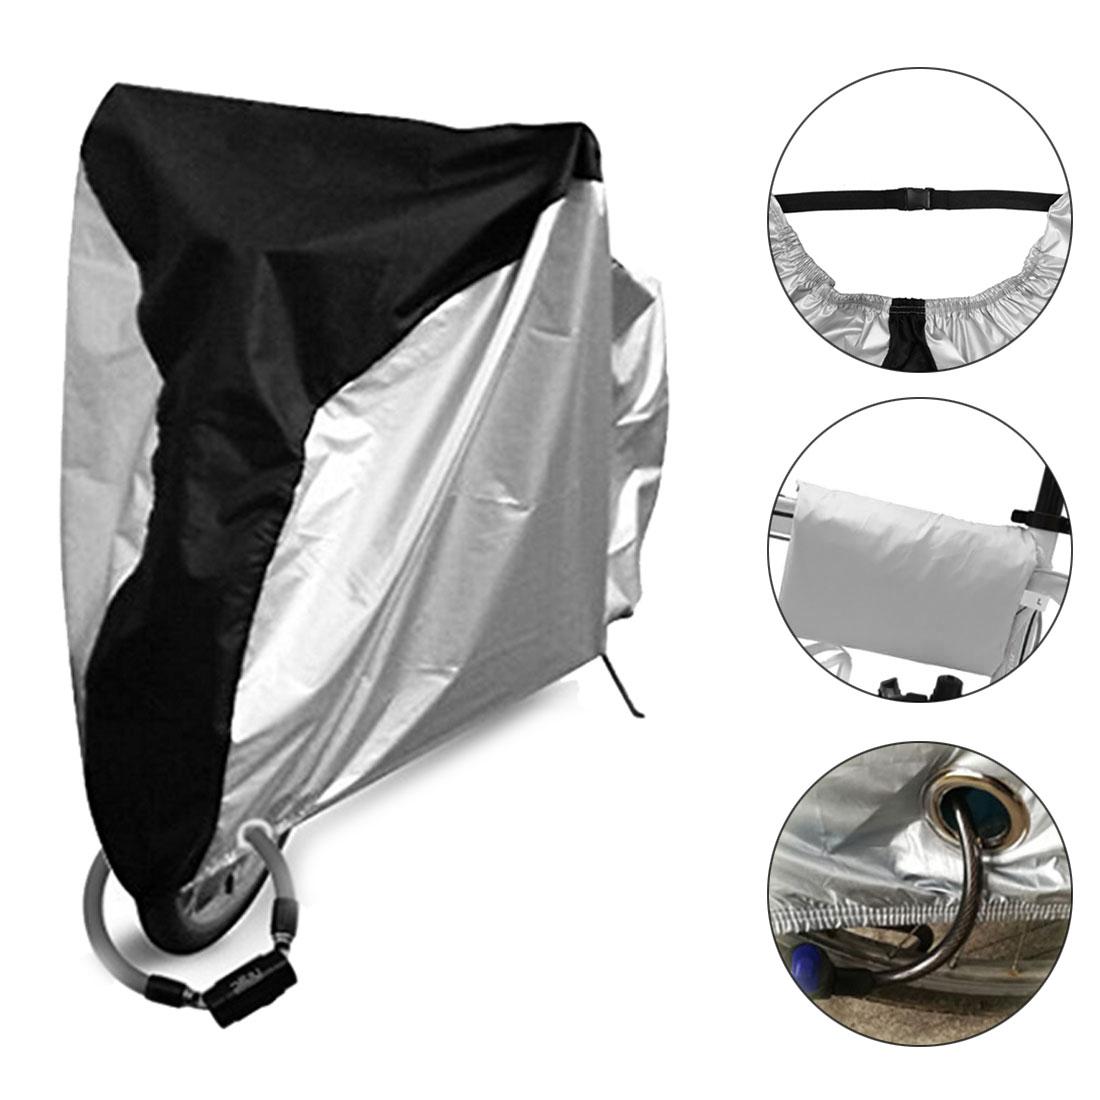 Outdoor Bicycle Bike Cover Rain Dust Protector Anti-UV Garage Storage XXXL Silve